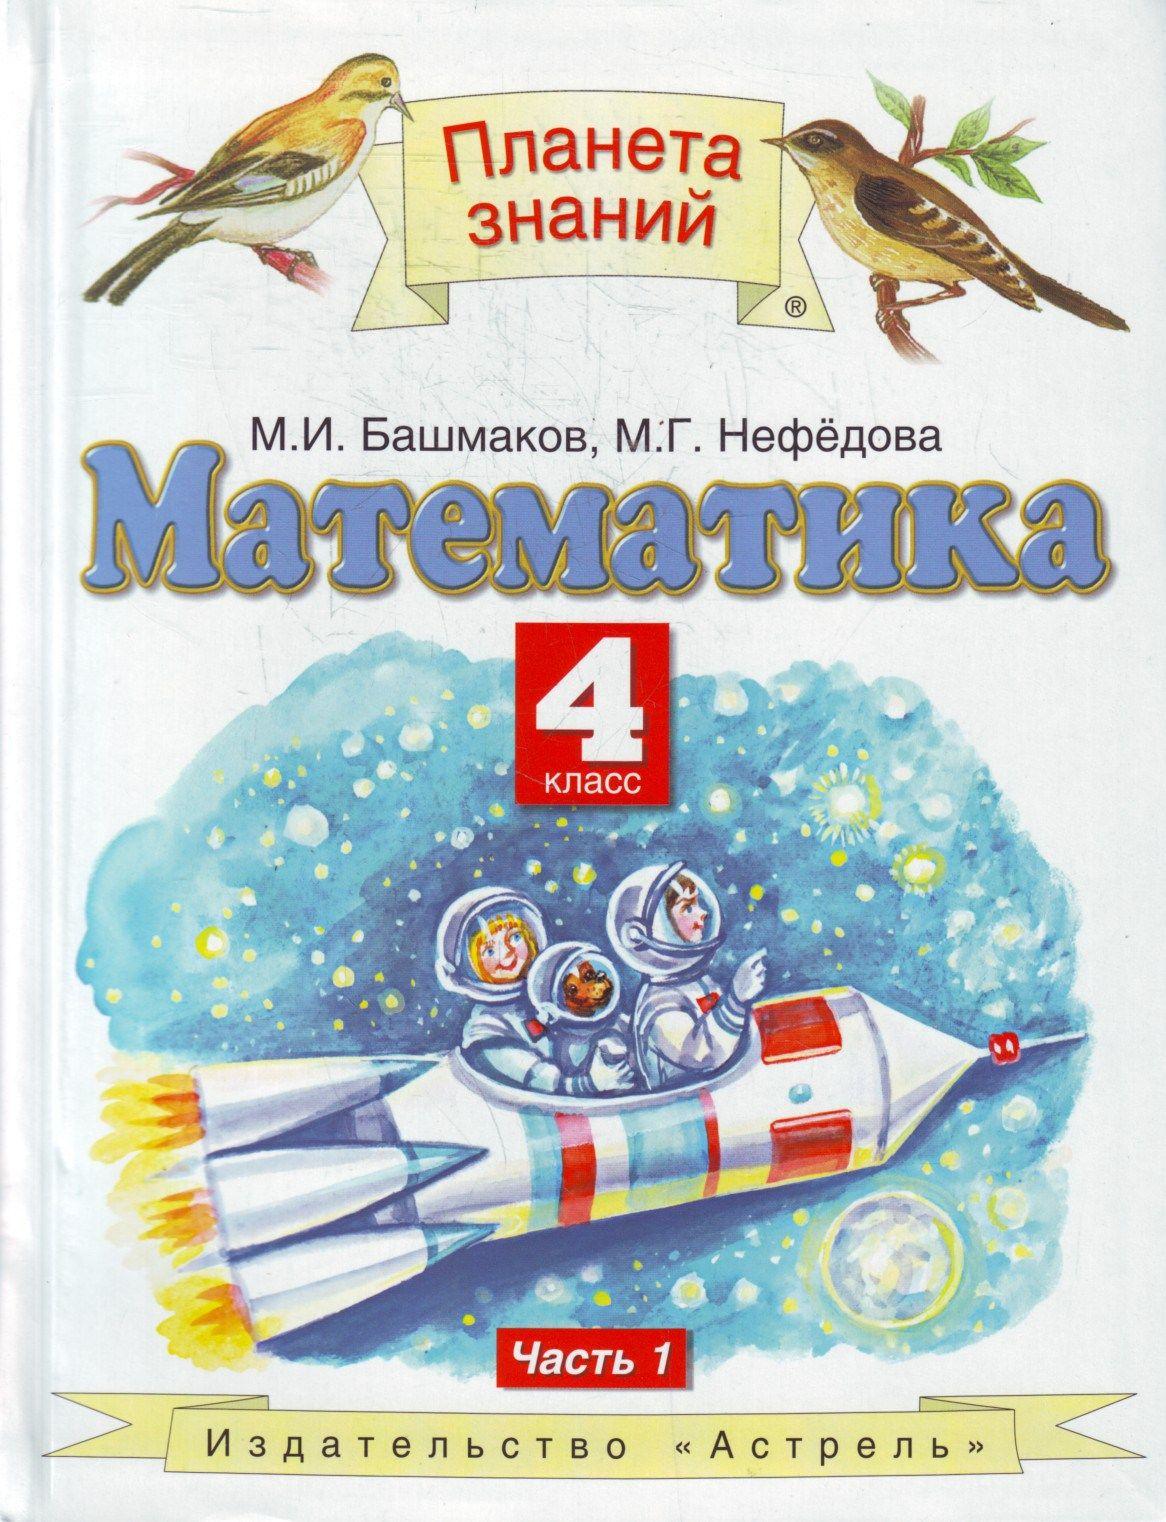 Решебник к учебнику планета знаний 4 класс